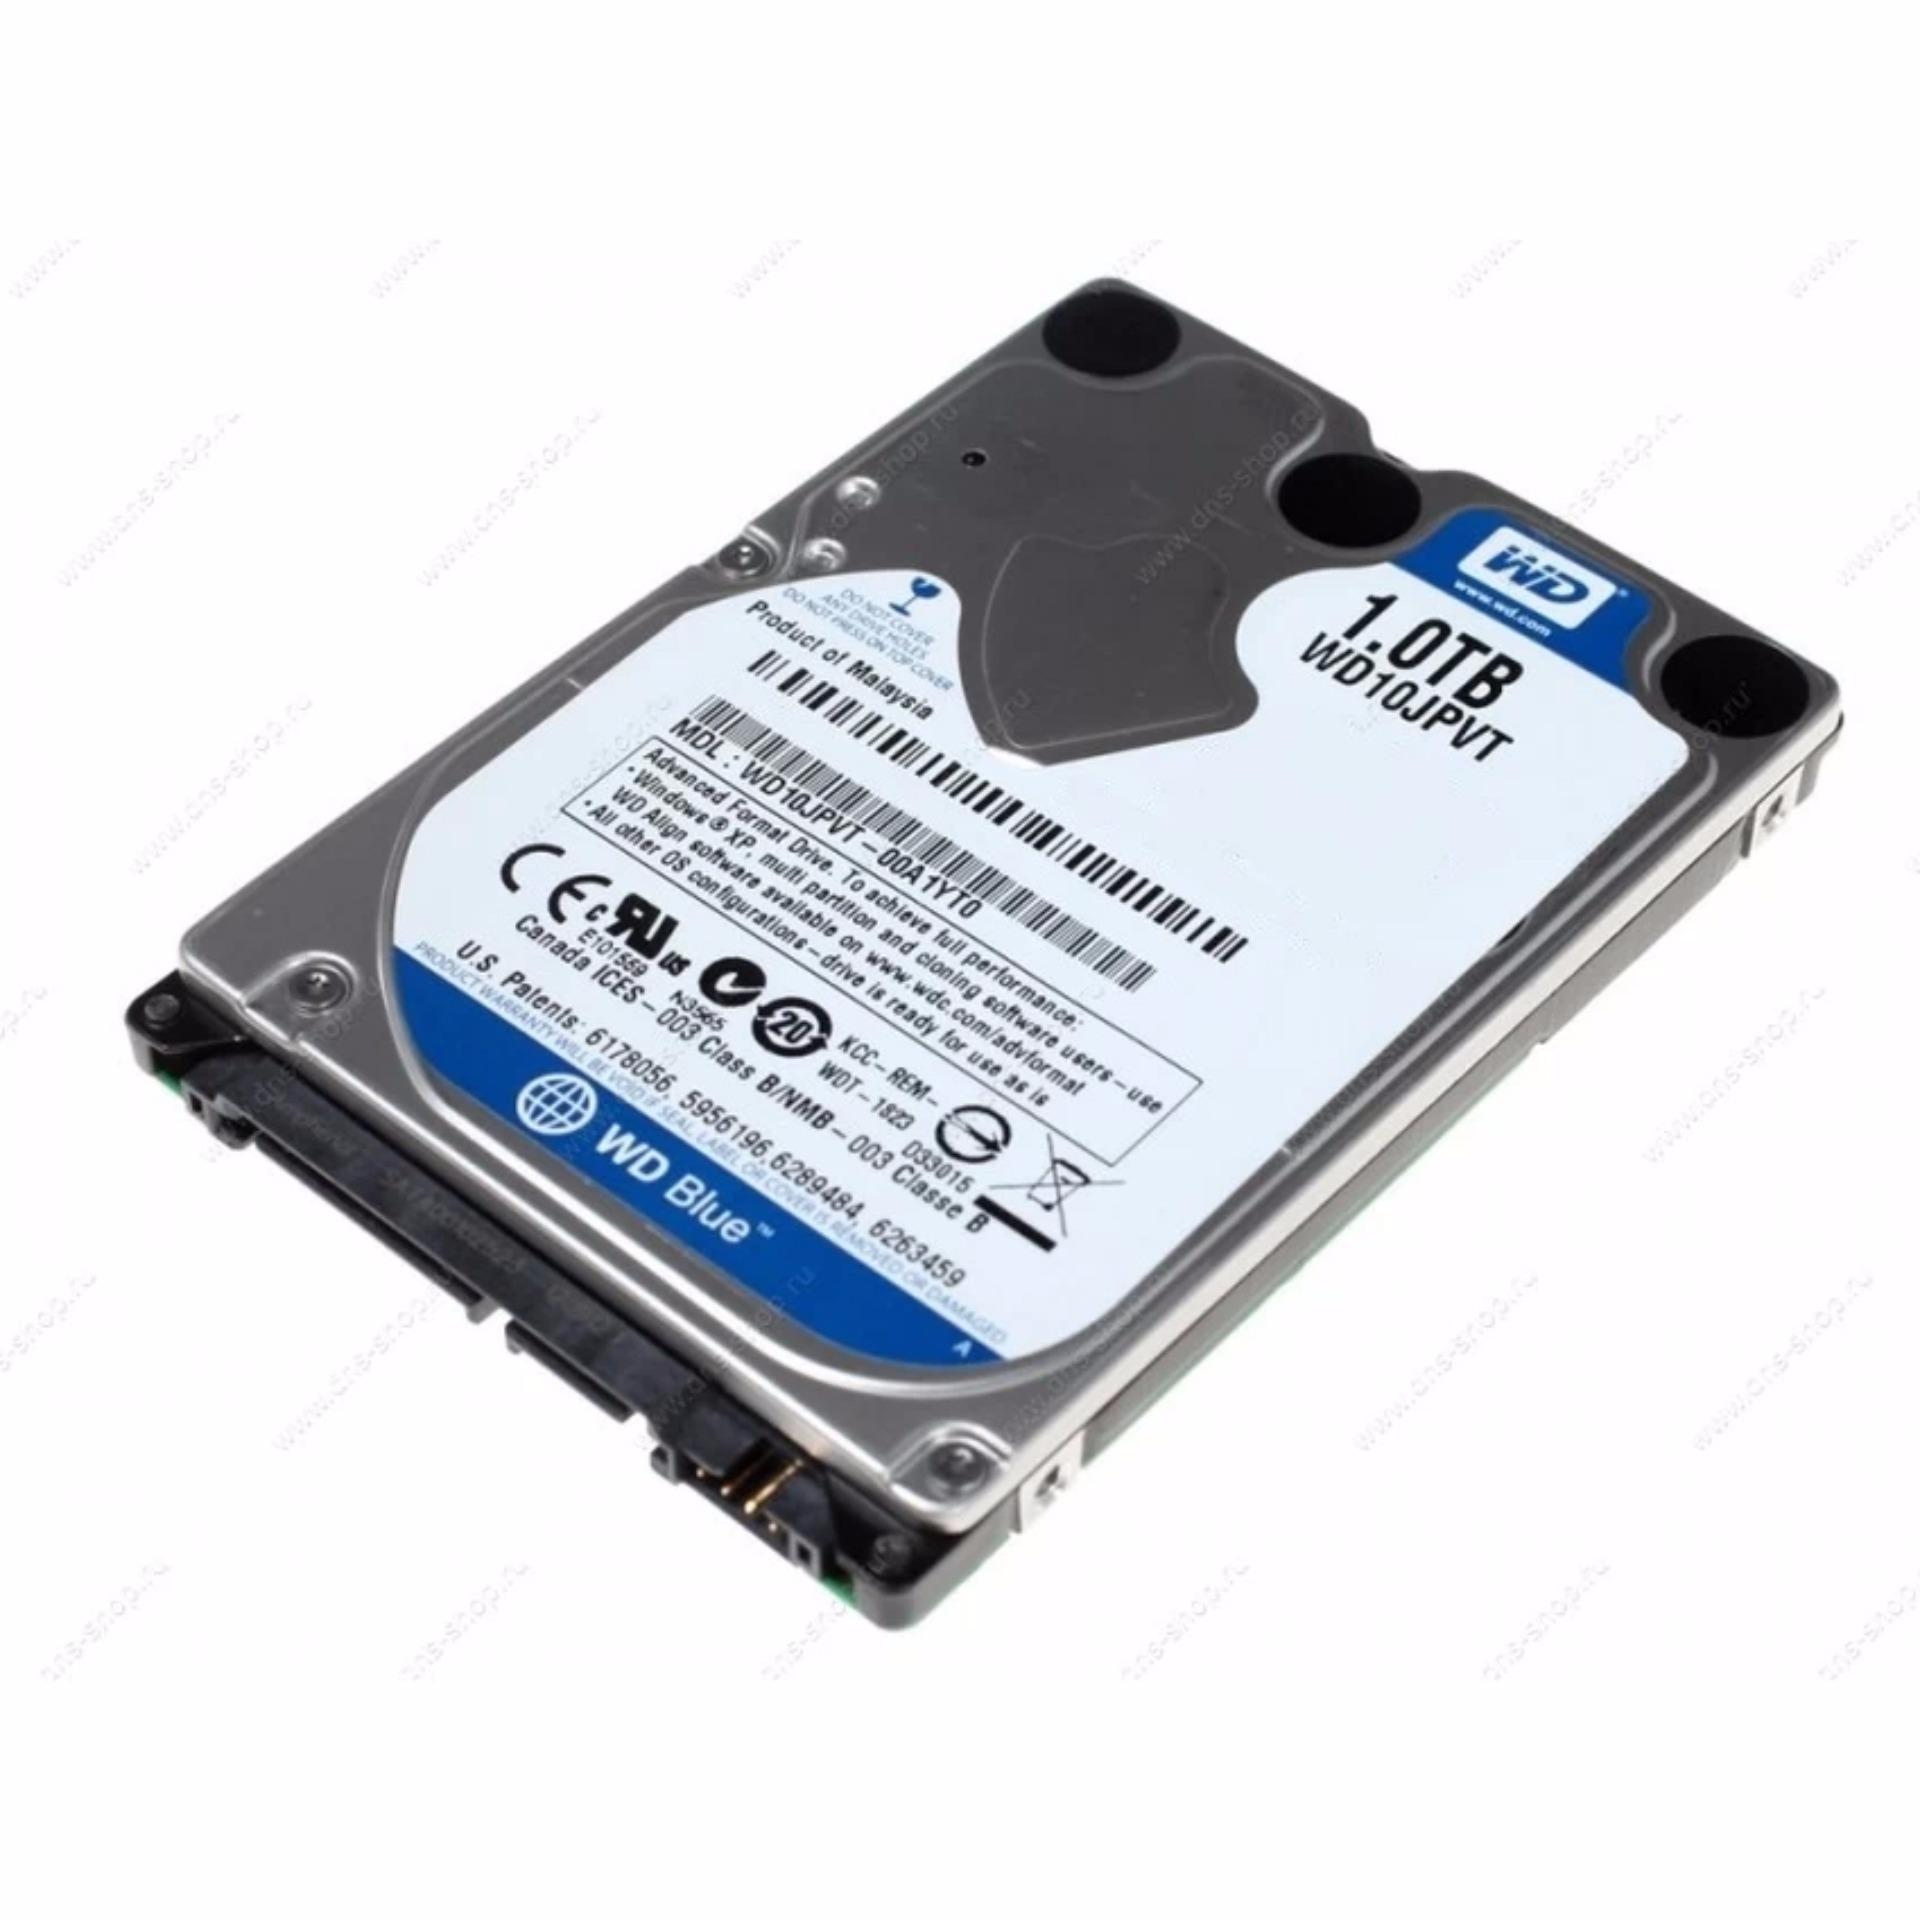 Philippines Western Digital Wd10jpvt 1tb 5400 Rpm 8mb Cache Sata Harddisk Wb Blue Hardisk Laptop 30gb S 25